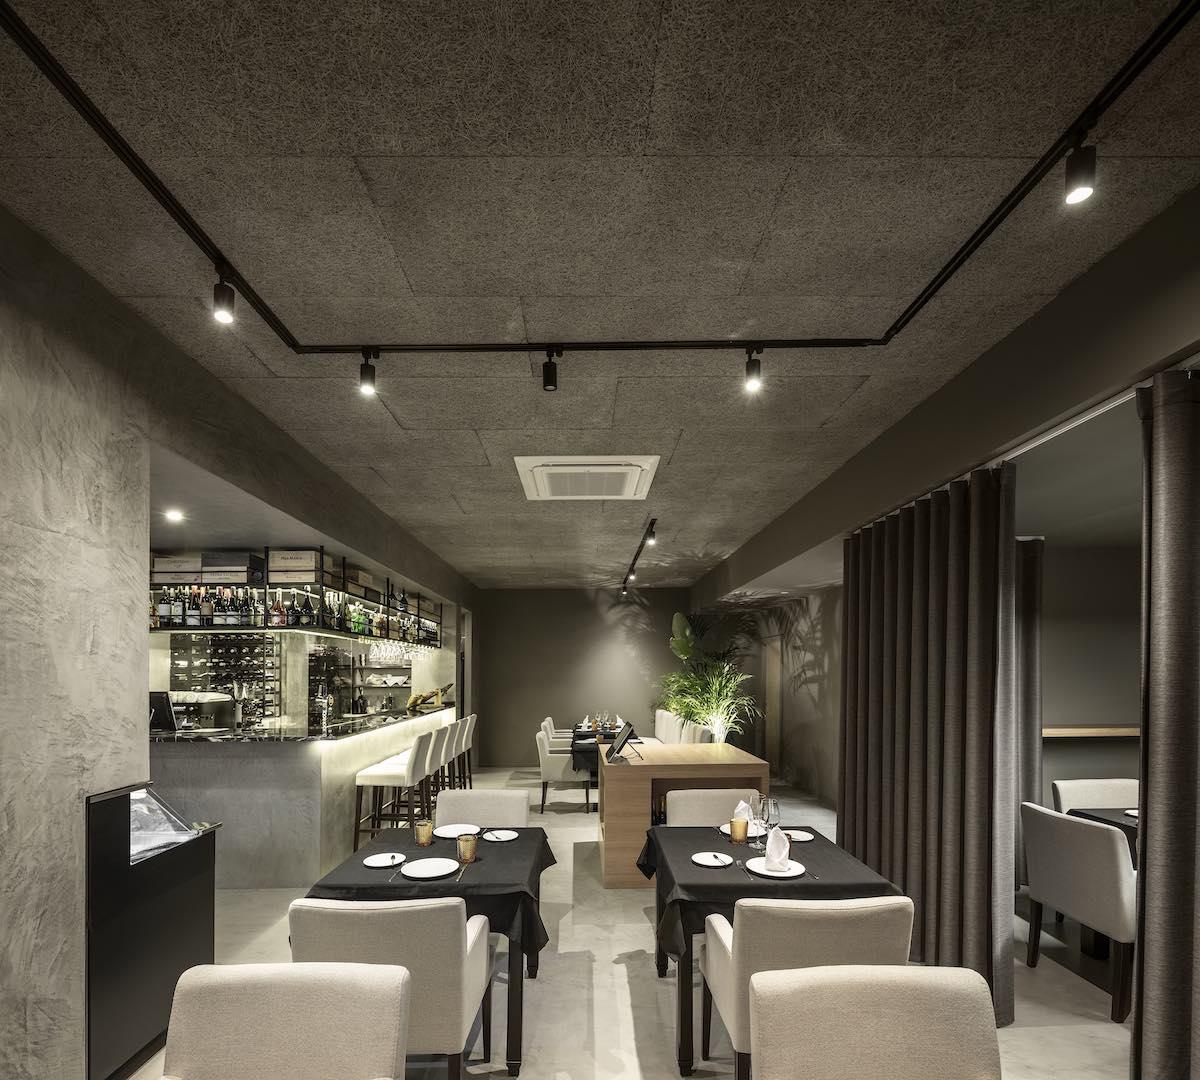 FAMA_Restaurant_Paulo_Martins_Arquitectura_and_design_AmazingArchitecture_%20004.jpg